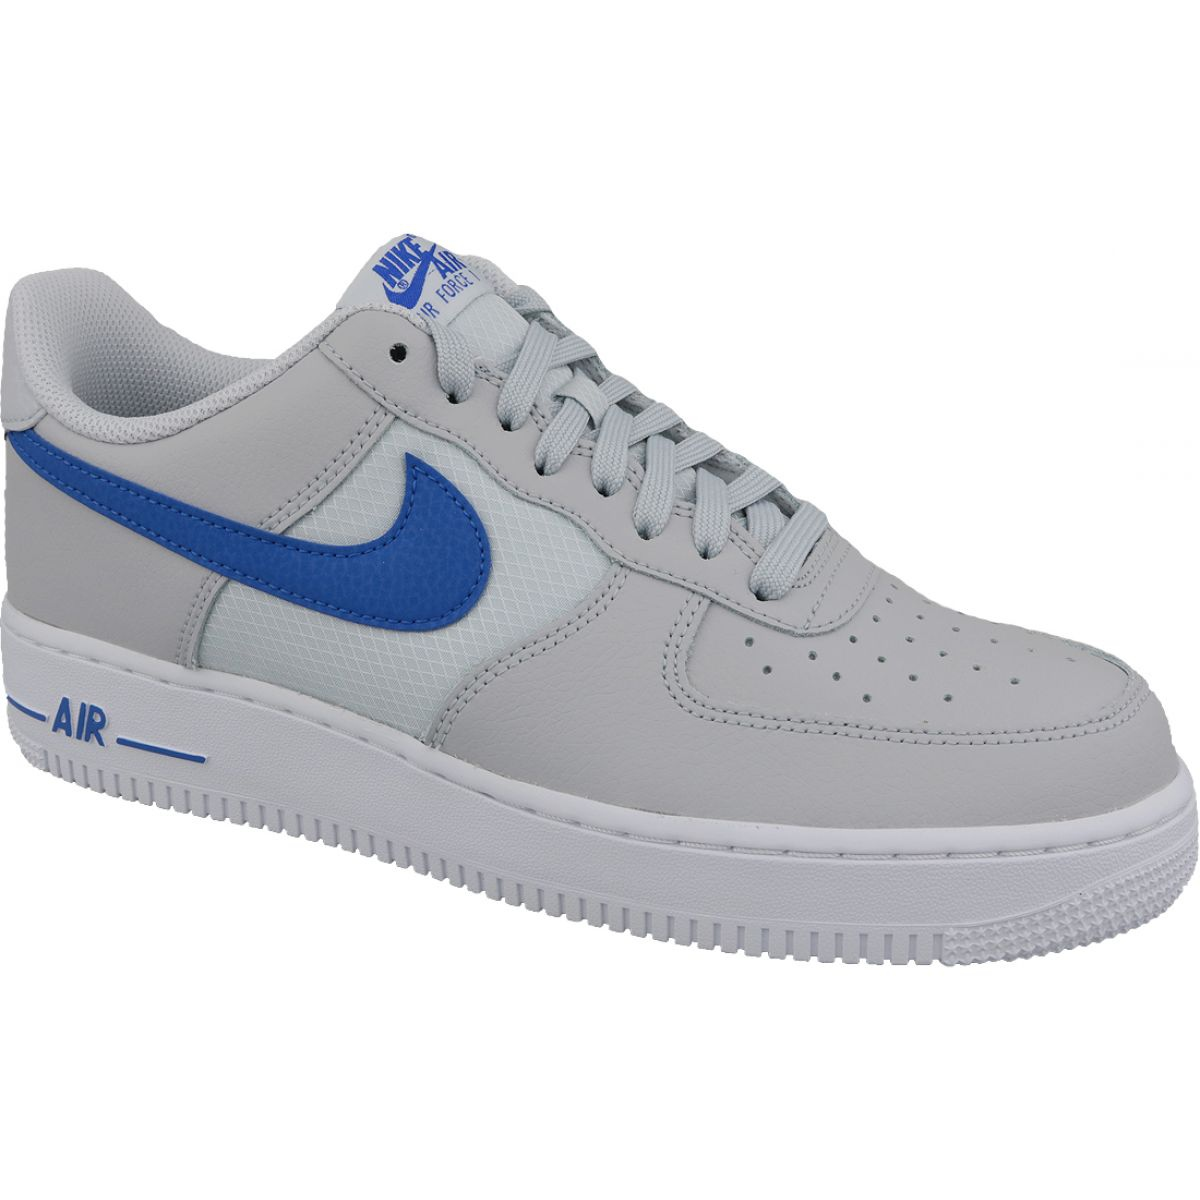 Nike Air Force 1 '07 LV8 Schuhe Schwarz Grau für Damen